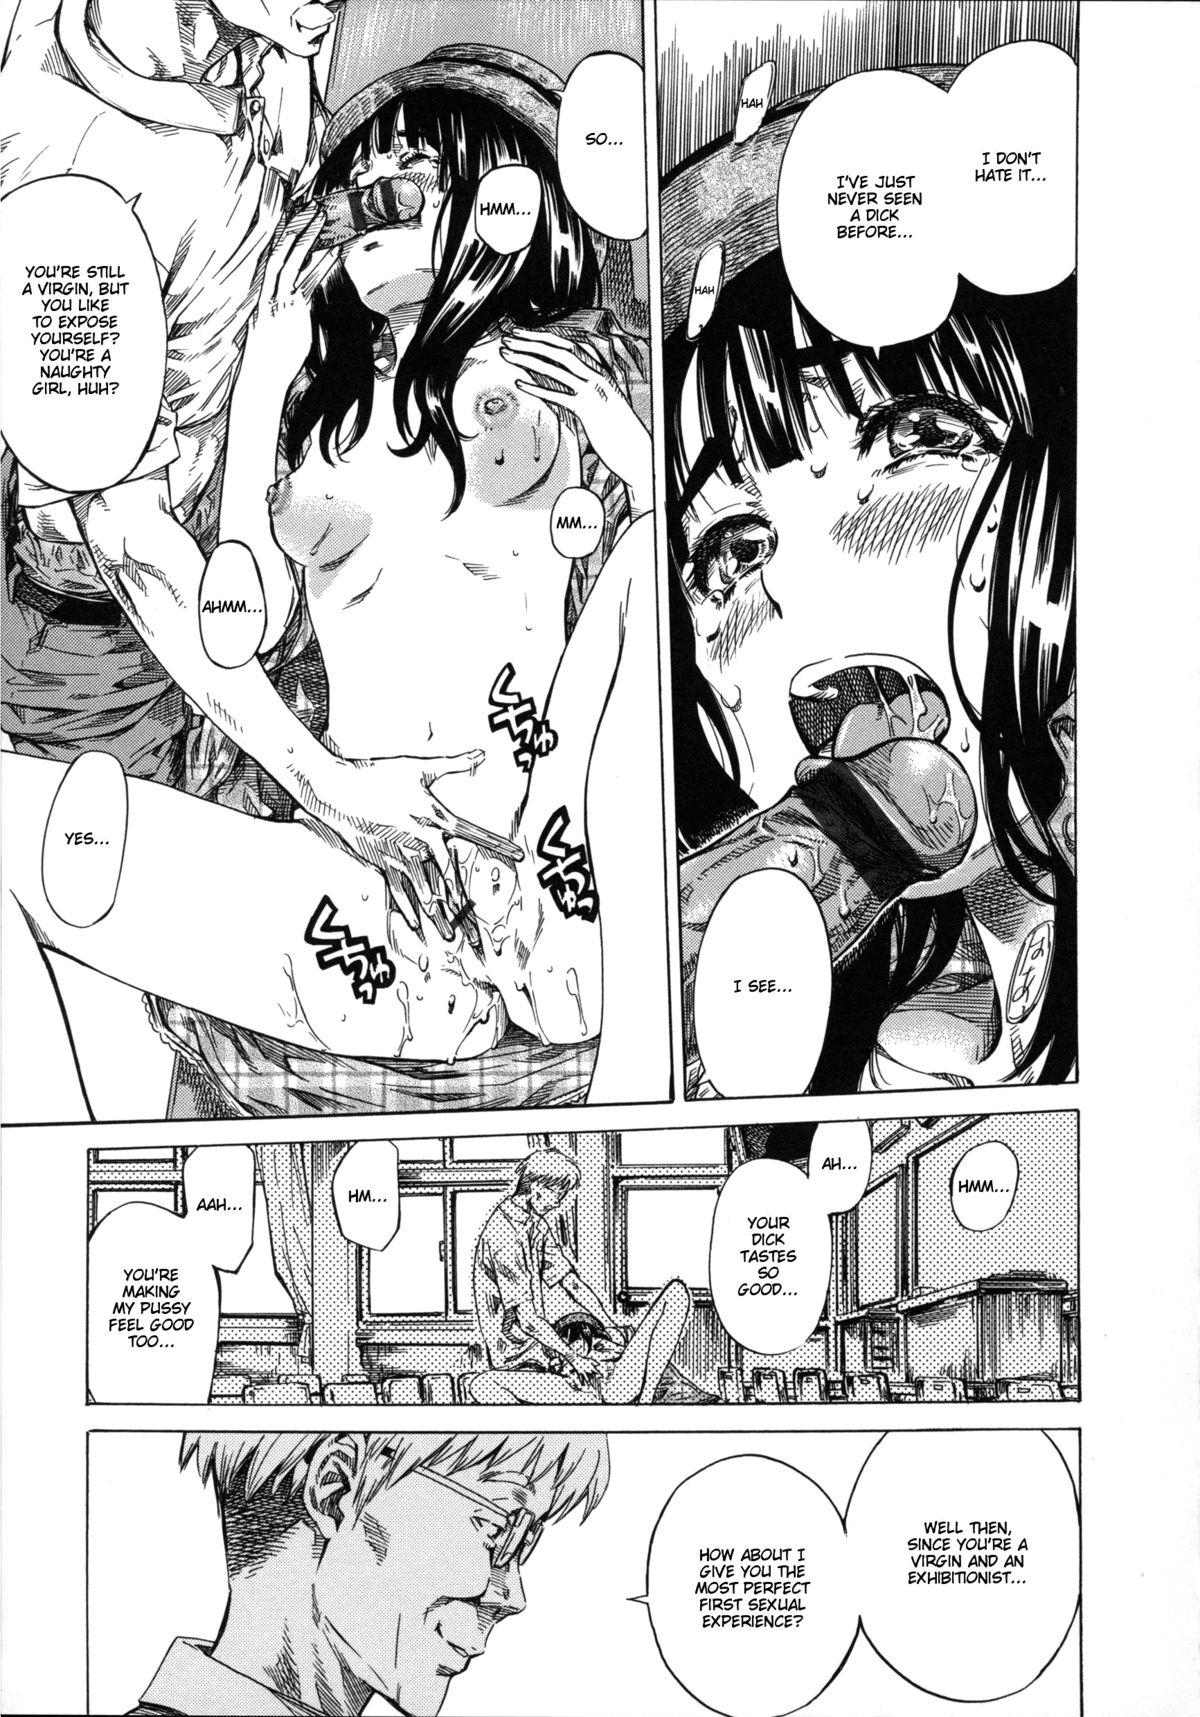 Kashiwazaki Miki wa Ironna Basho de Zenra Sanpo Shitemita | Miki Kashiwazaki Goes Naked in All Sorts of Places 18